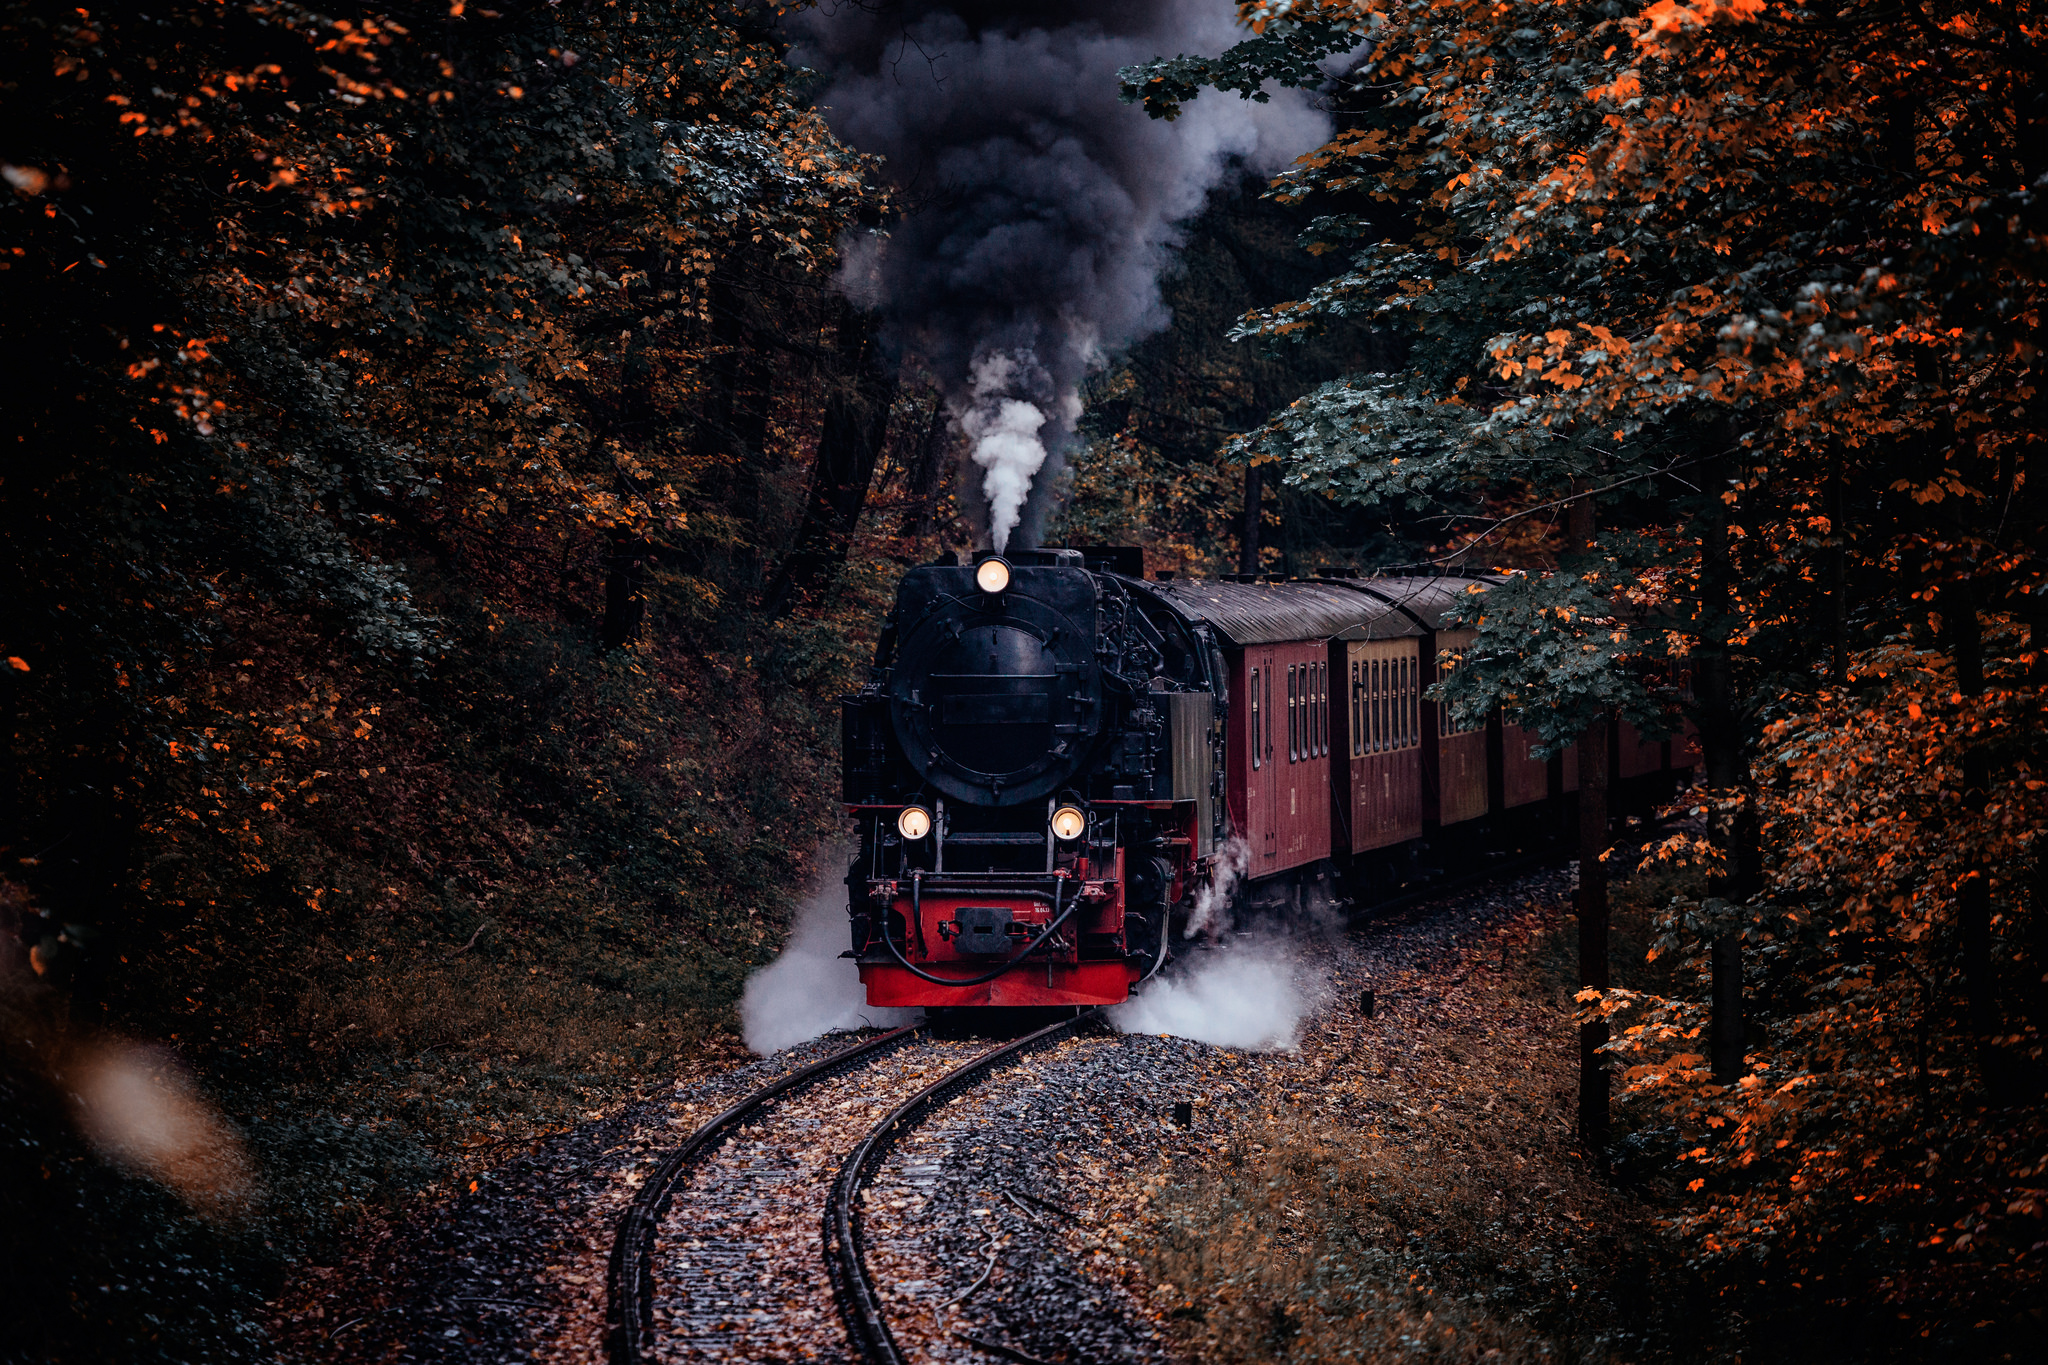 Die Harzer Schmalspurbahn im Thumkuhlental, Germany